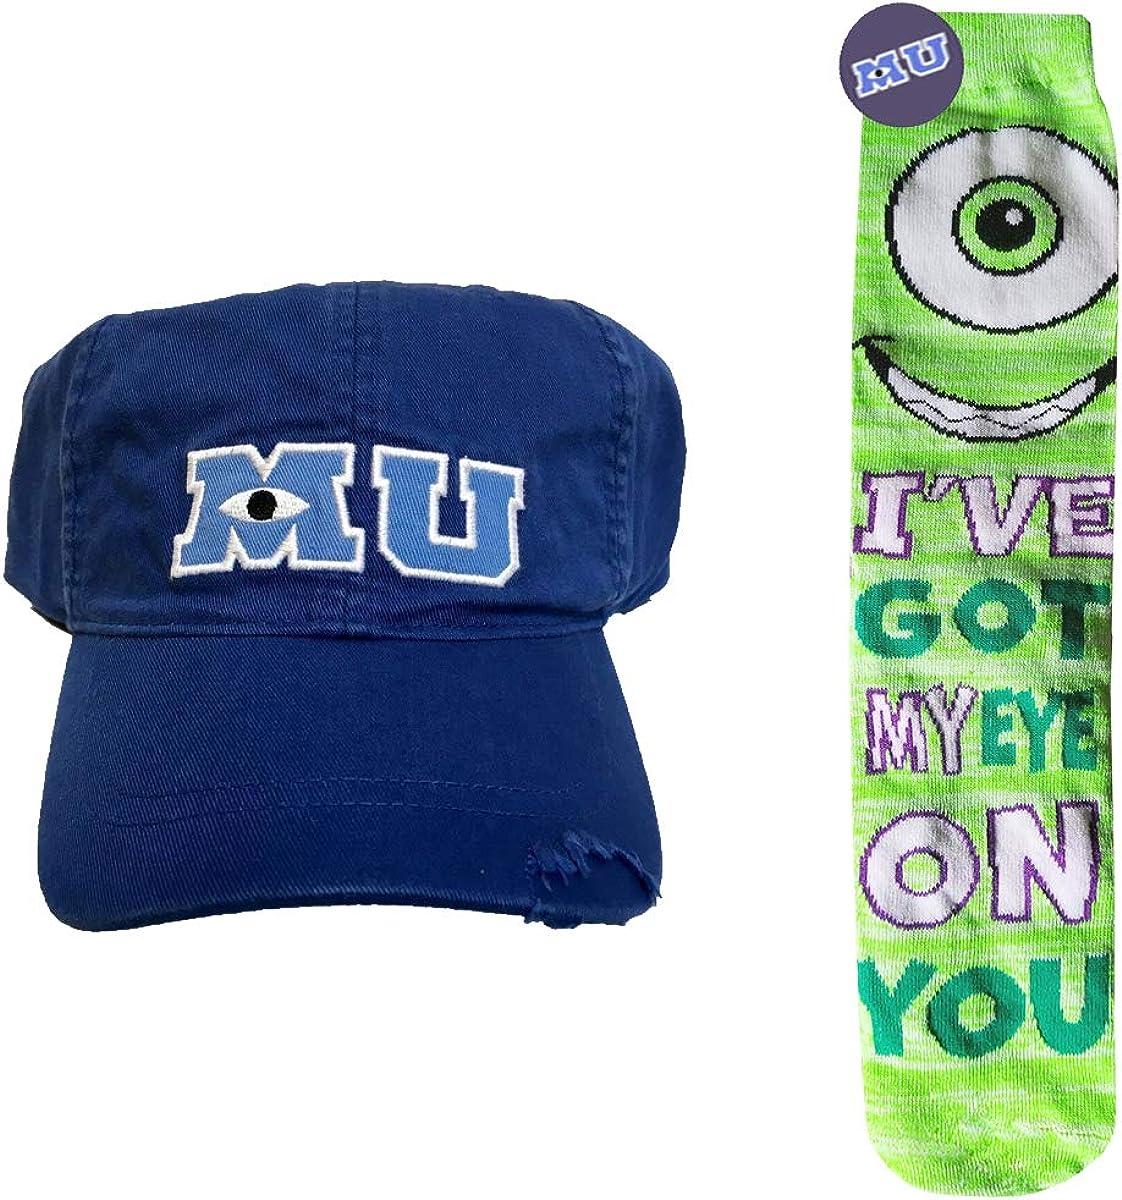 Disney Pixar Monsters University Mike Wazowski Socks And Mu Adults Bonus Disney Pixar Mystery Button Amazon De Bekleidung